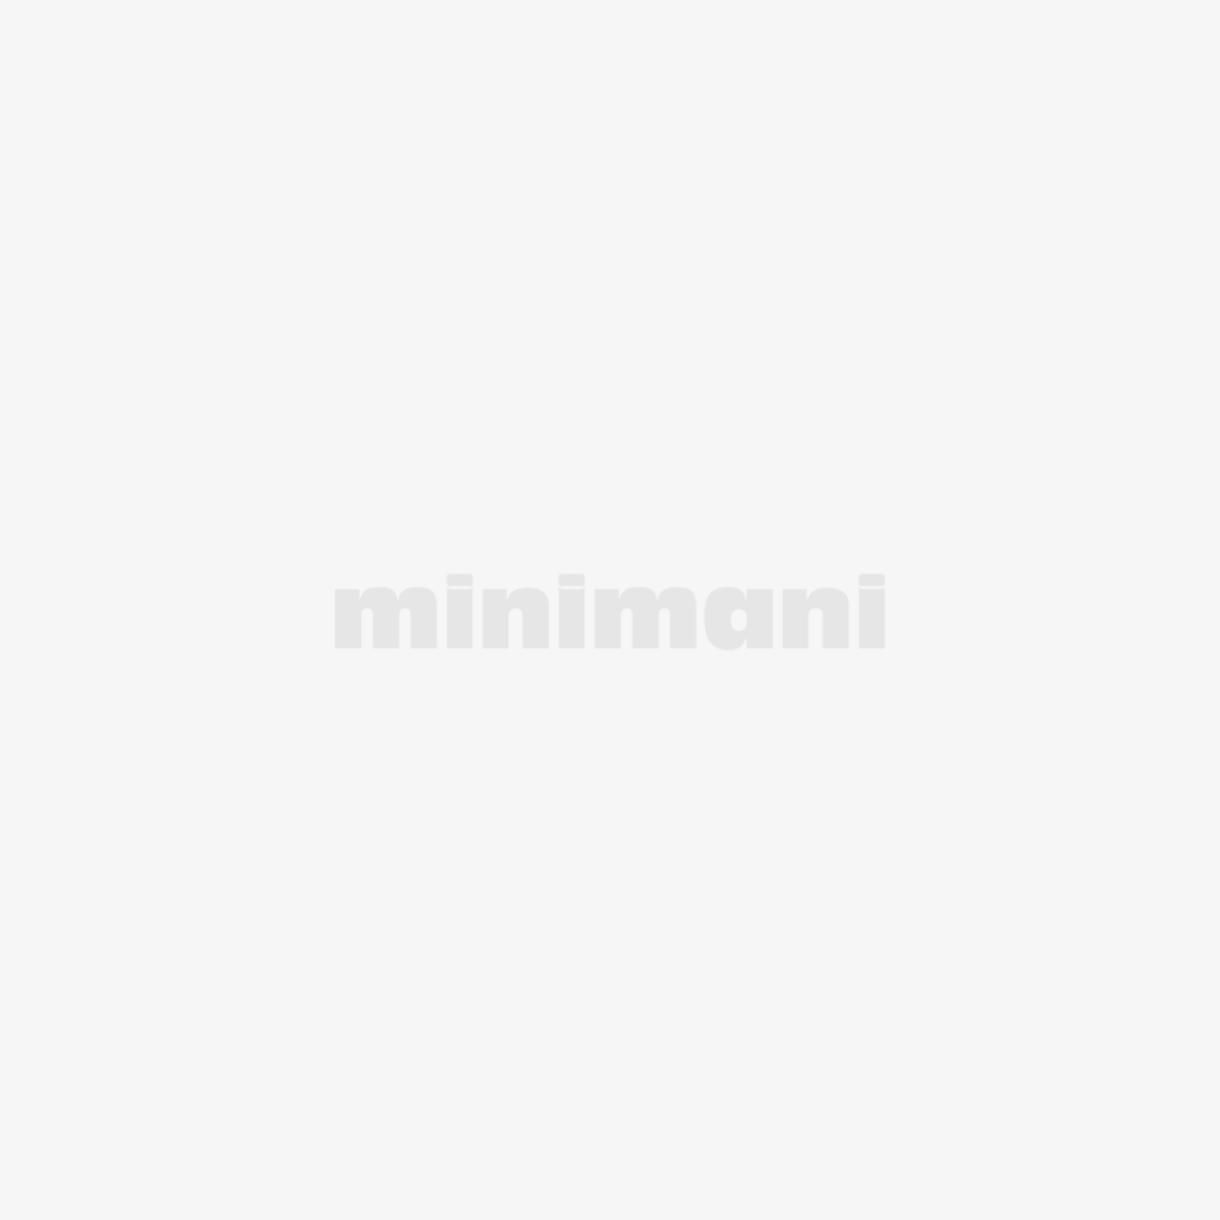 NUTRILETT CHOCO MOUSSE CRUMBLE BAR 60 G